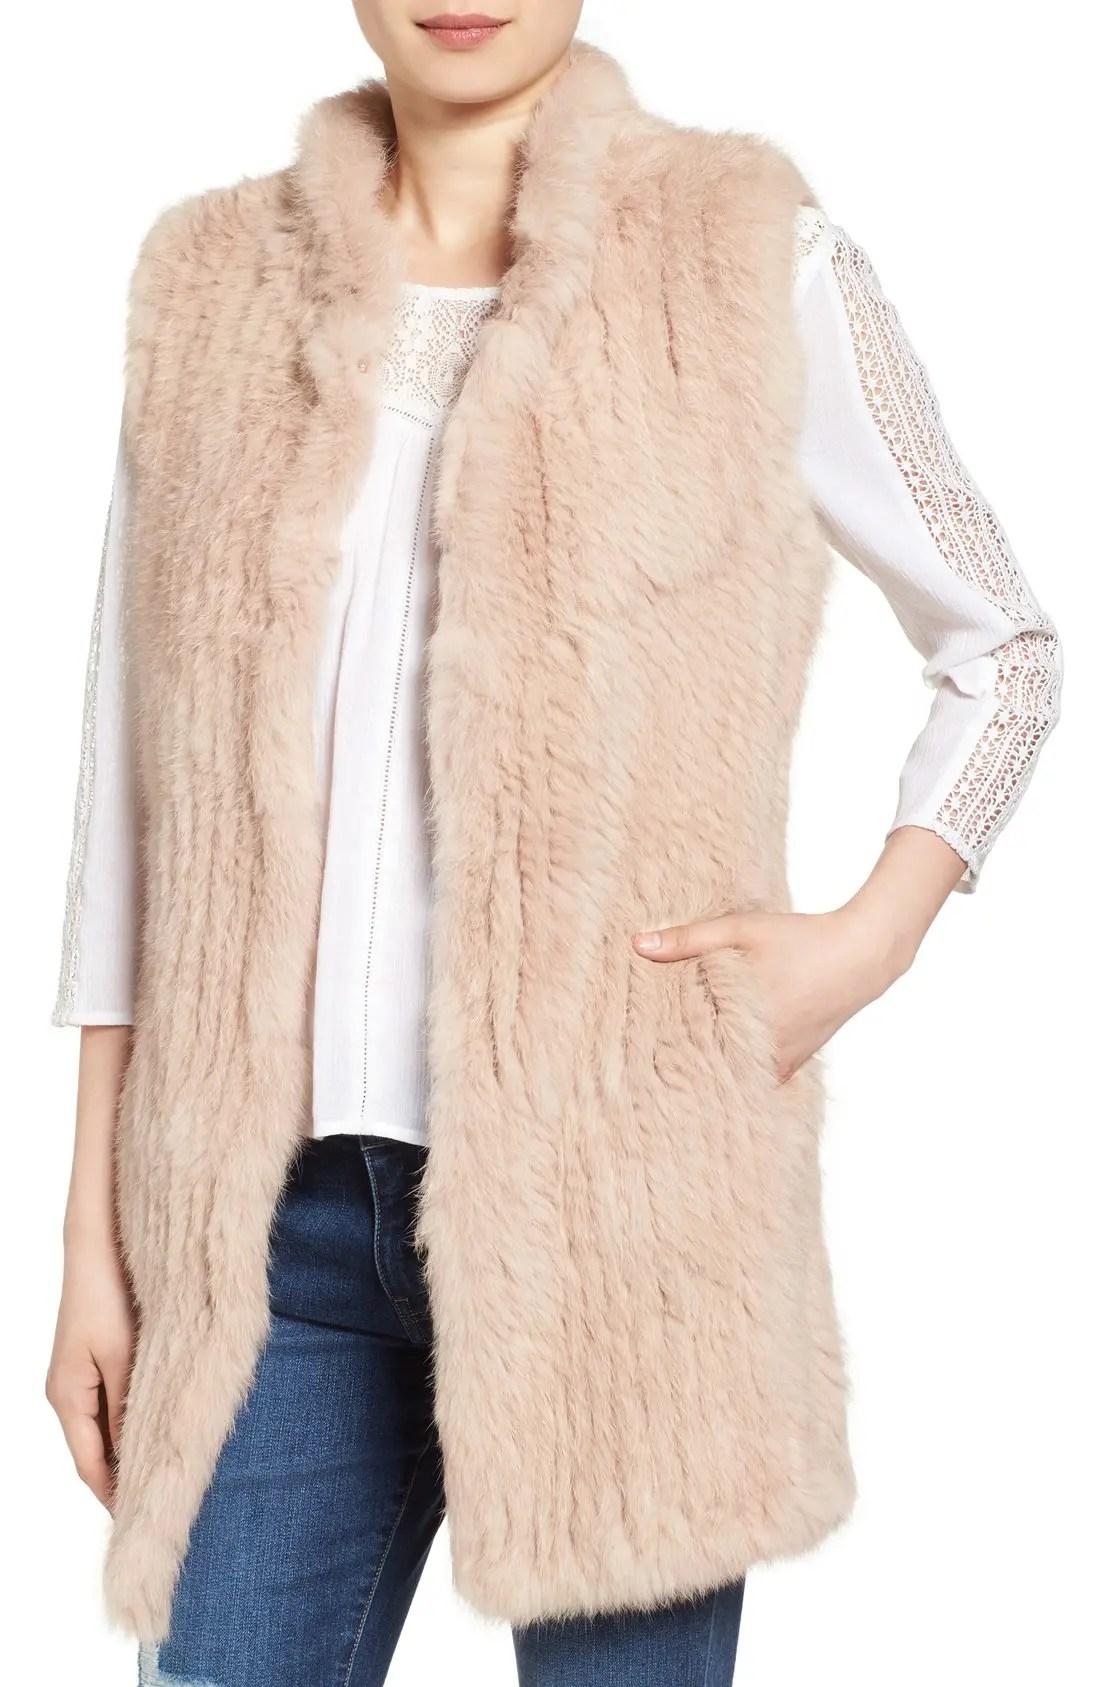 Main Image - Love Token Long Genuine Rabbit Fur Vest